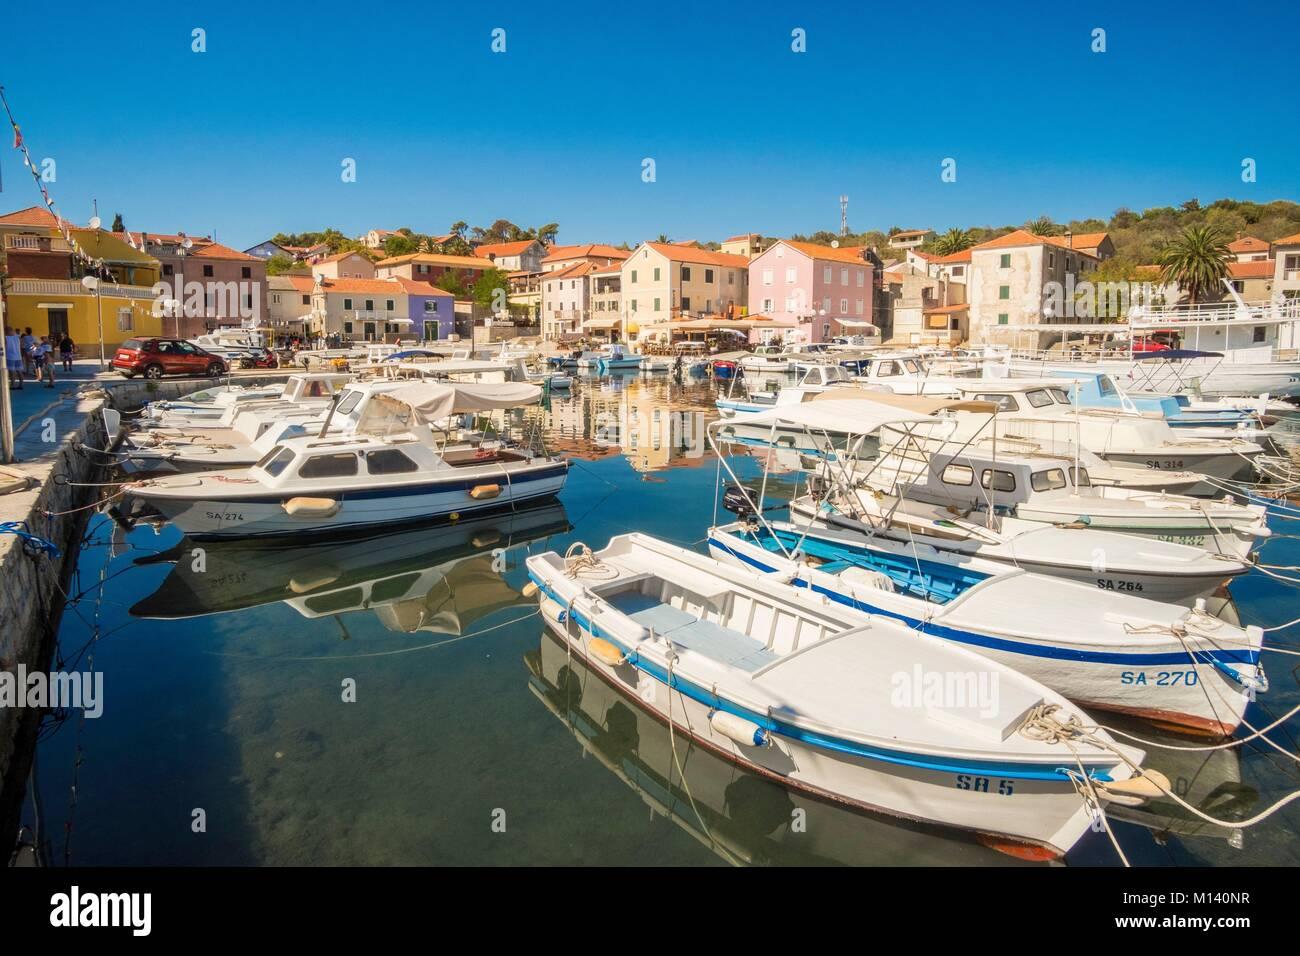 La Croatie, Dalmatie du Nord, de la côte dalmate, archipel de Zadar, l'île de Dugi Otok Sali, village Photo Stock